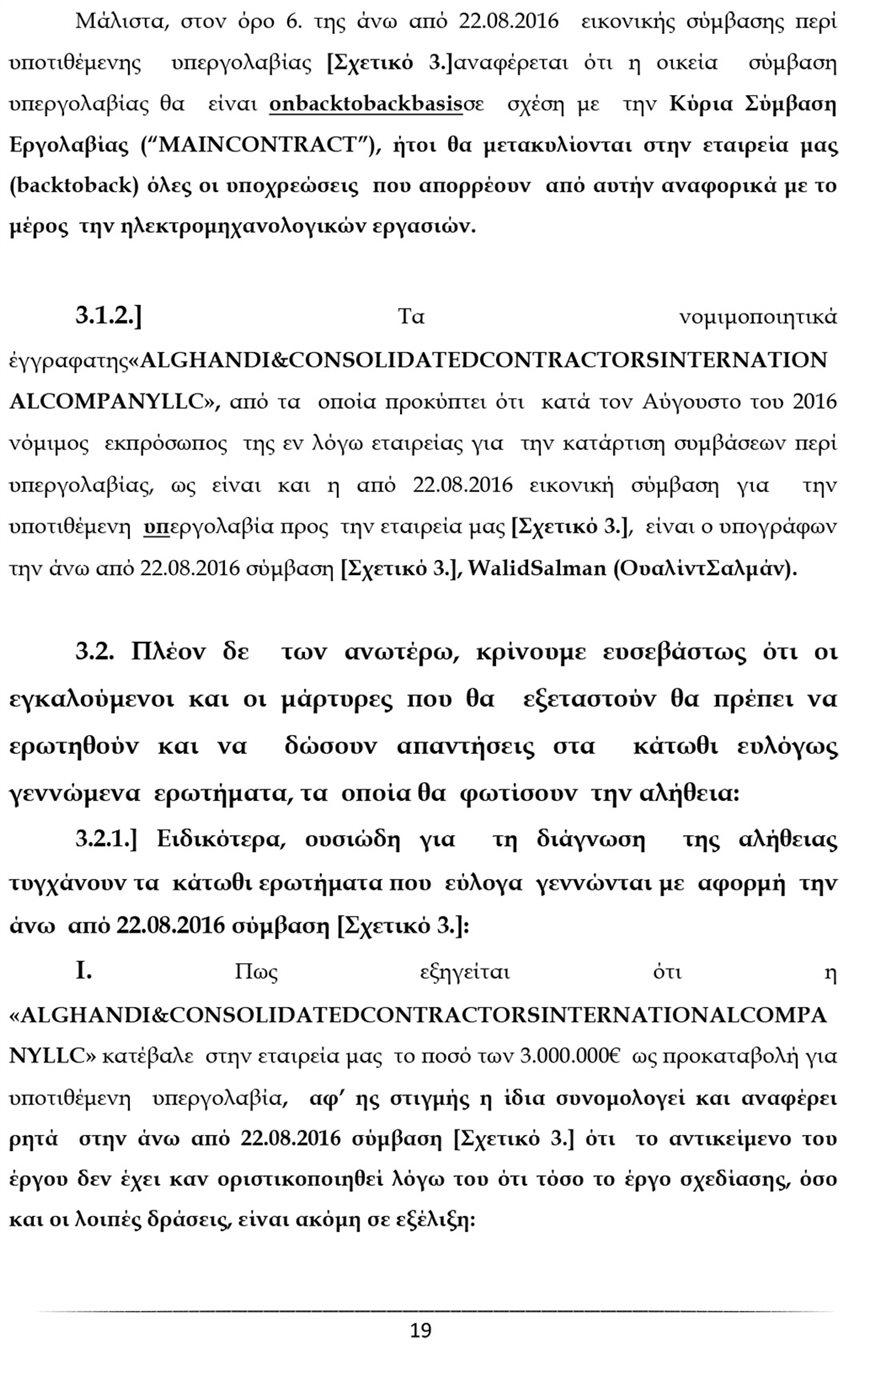 ypomnima-19